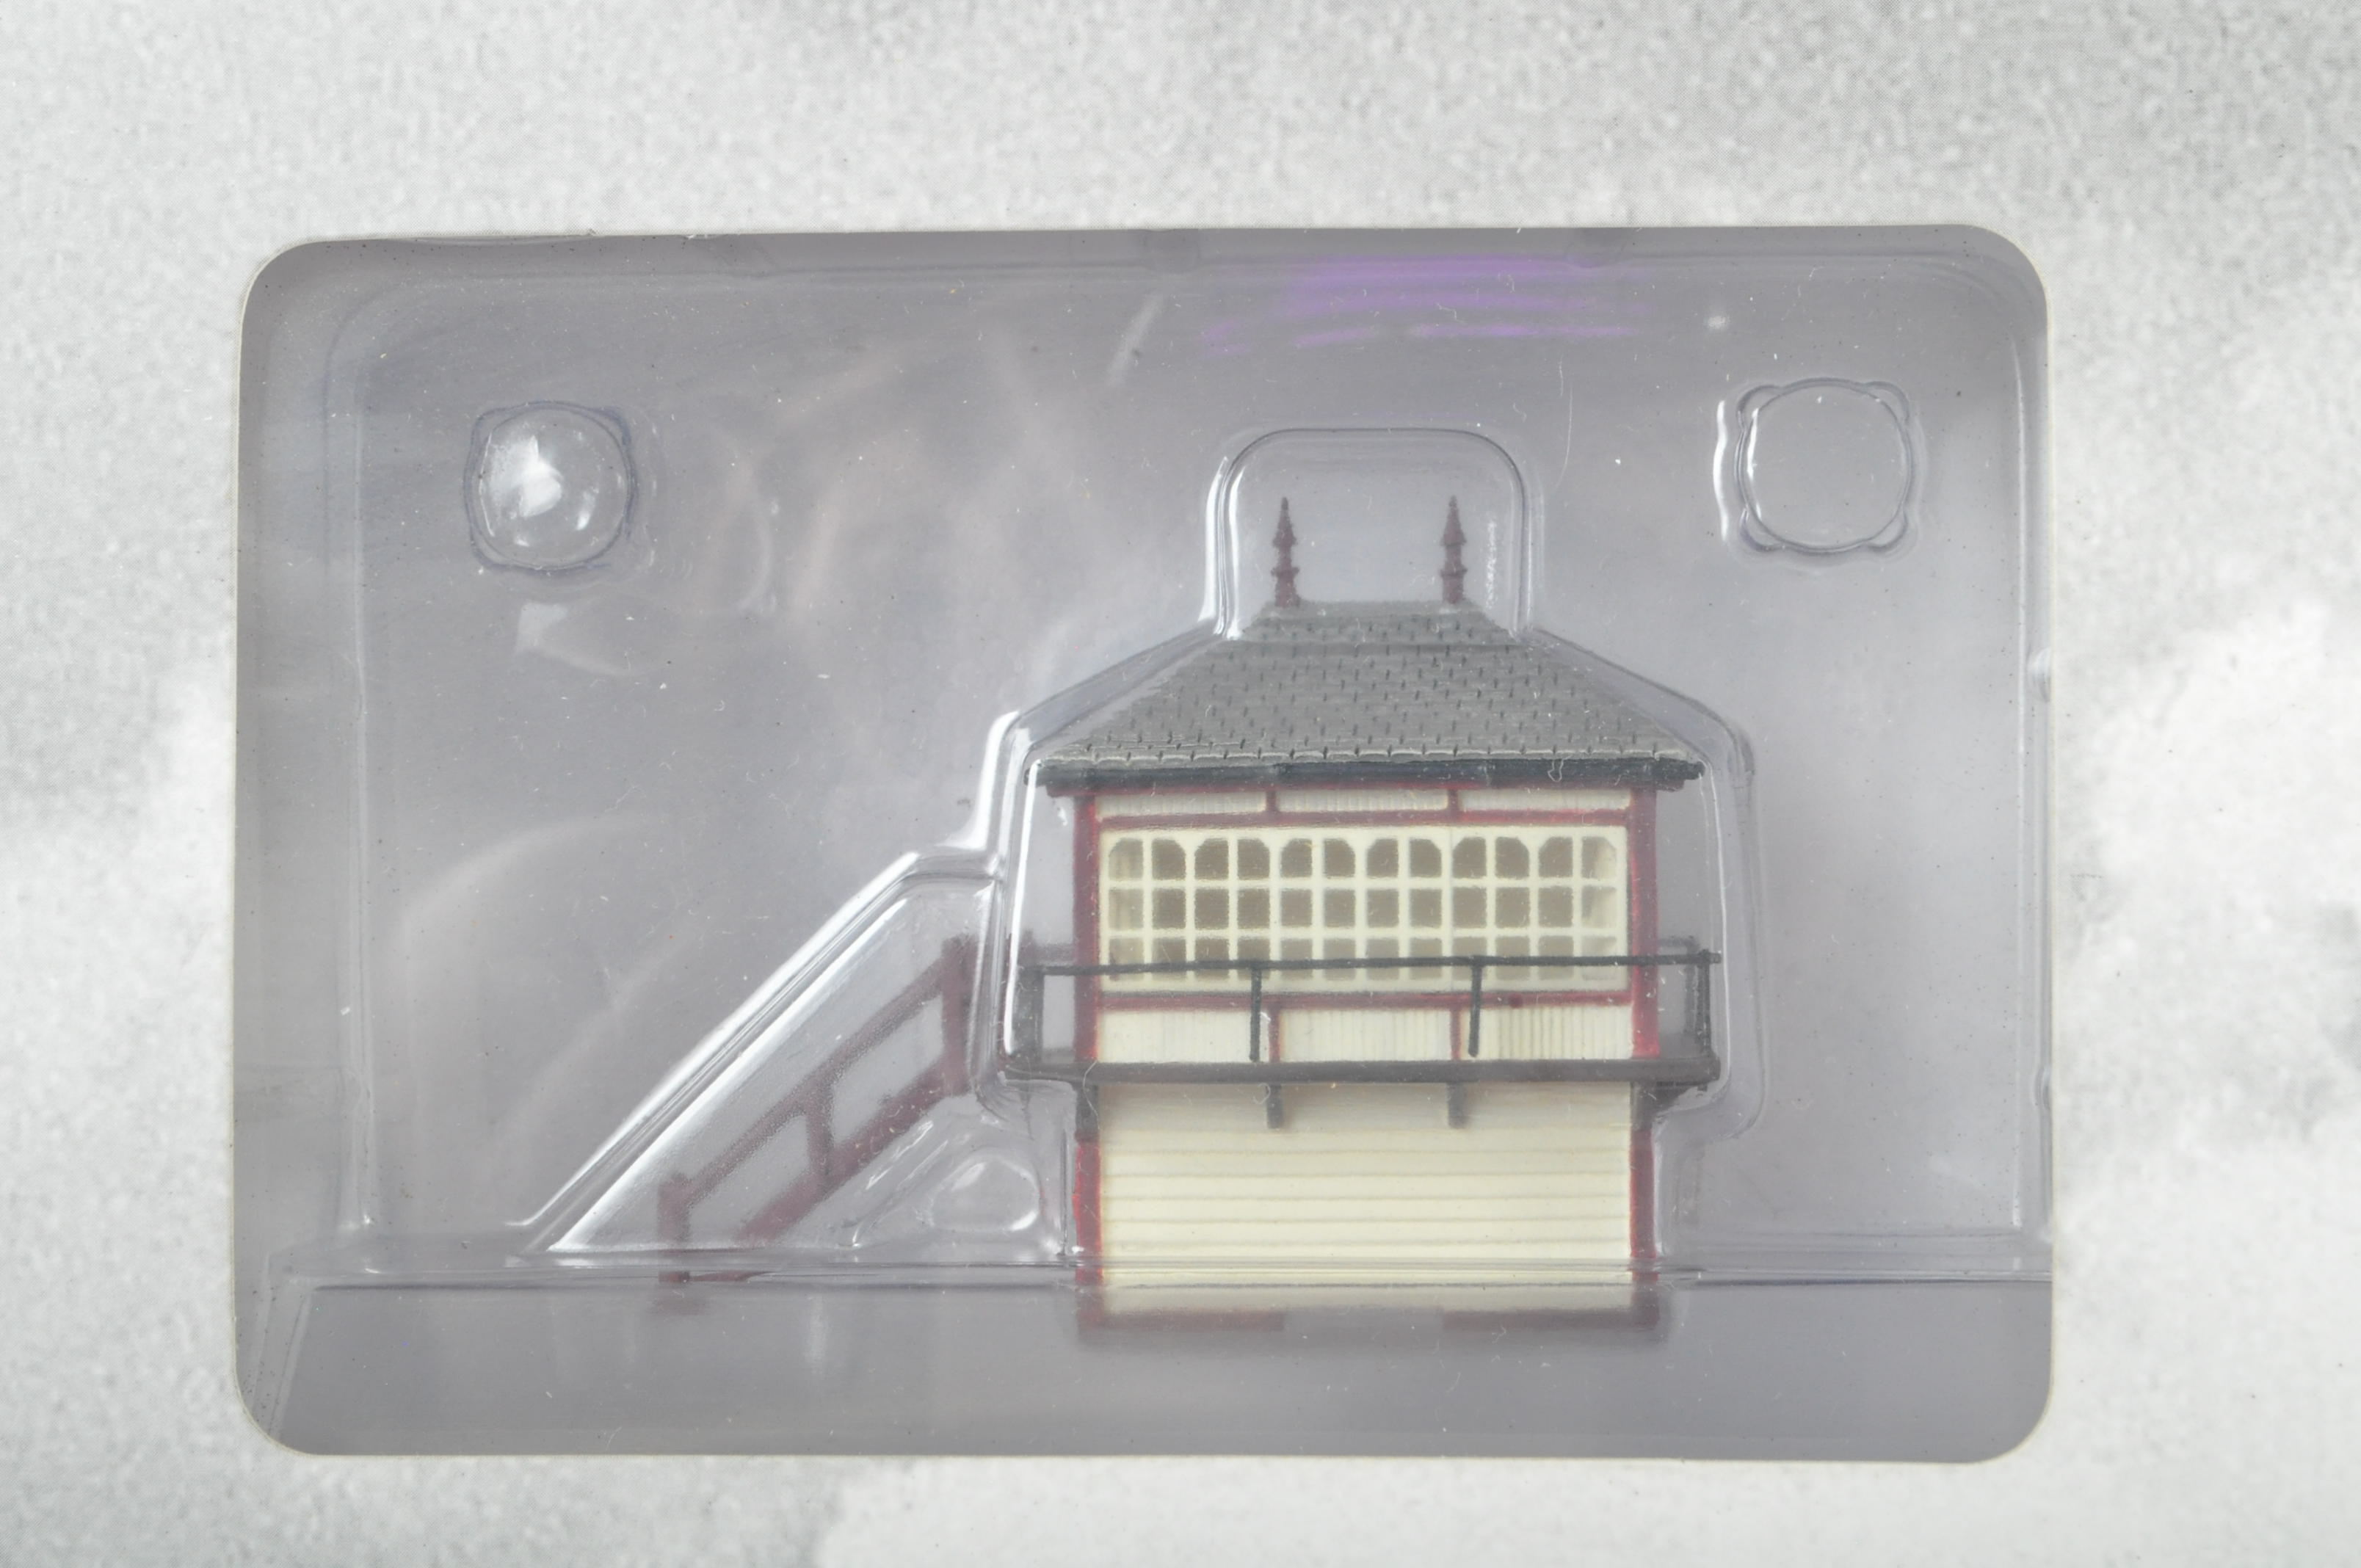 ORIGINAL BOXED GRAHAM FARISH CUMBRIAN MOUNTAIN EXPRESS TRAINSET - Image 4 of 9